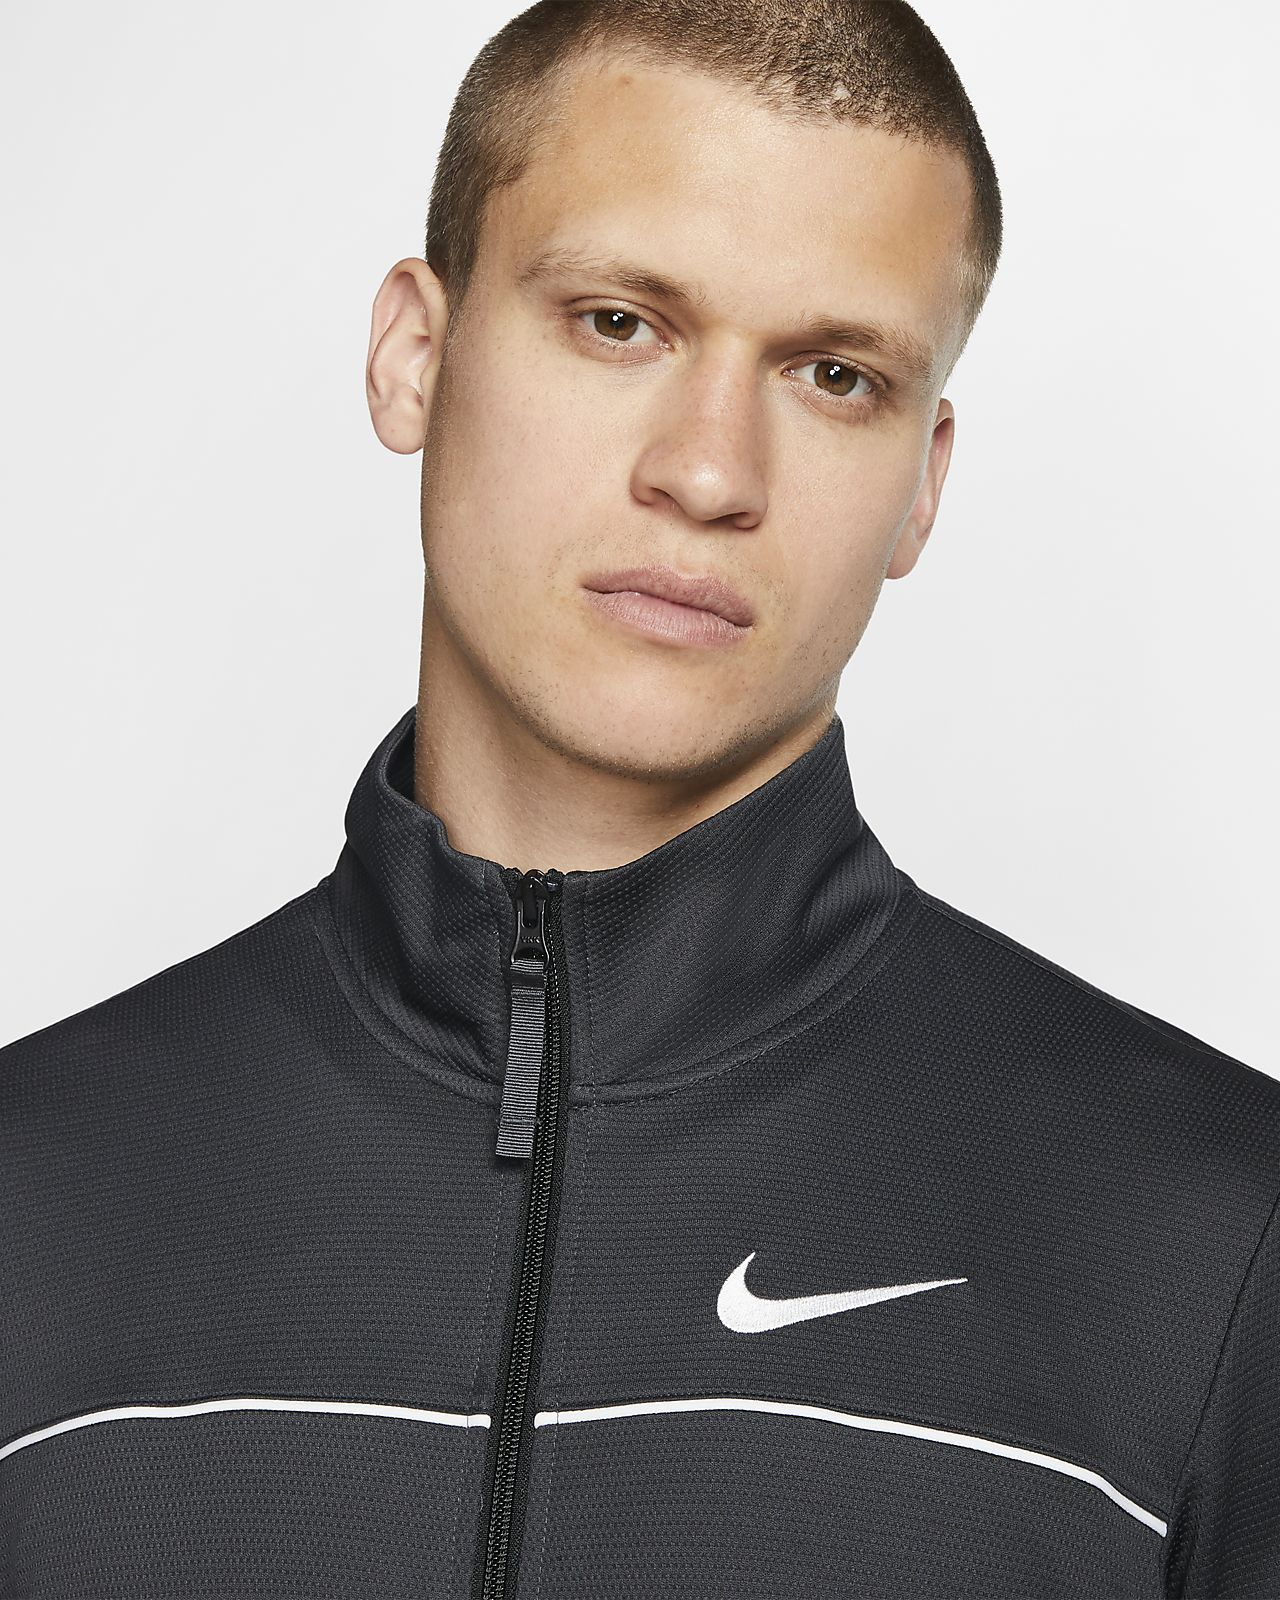 Nike Basketball Rivalry Tracksuit Jacket